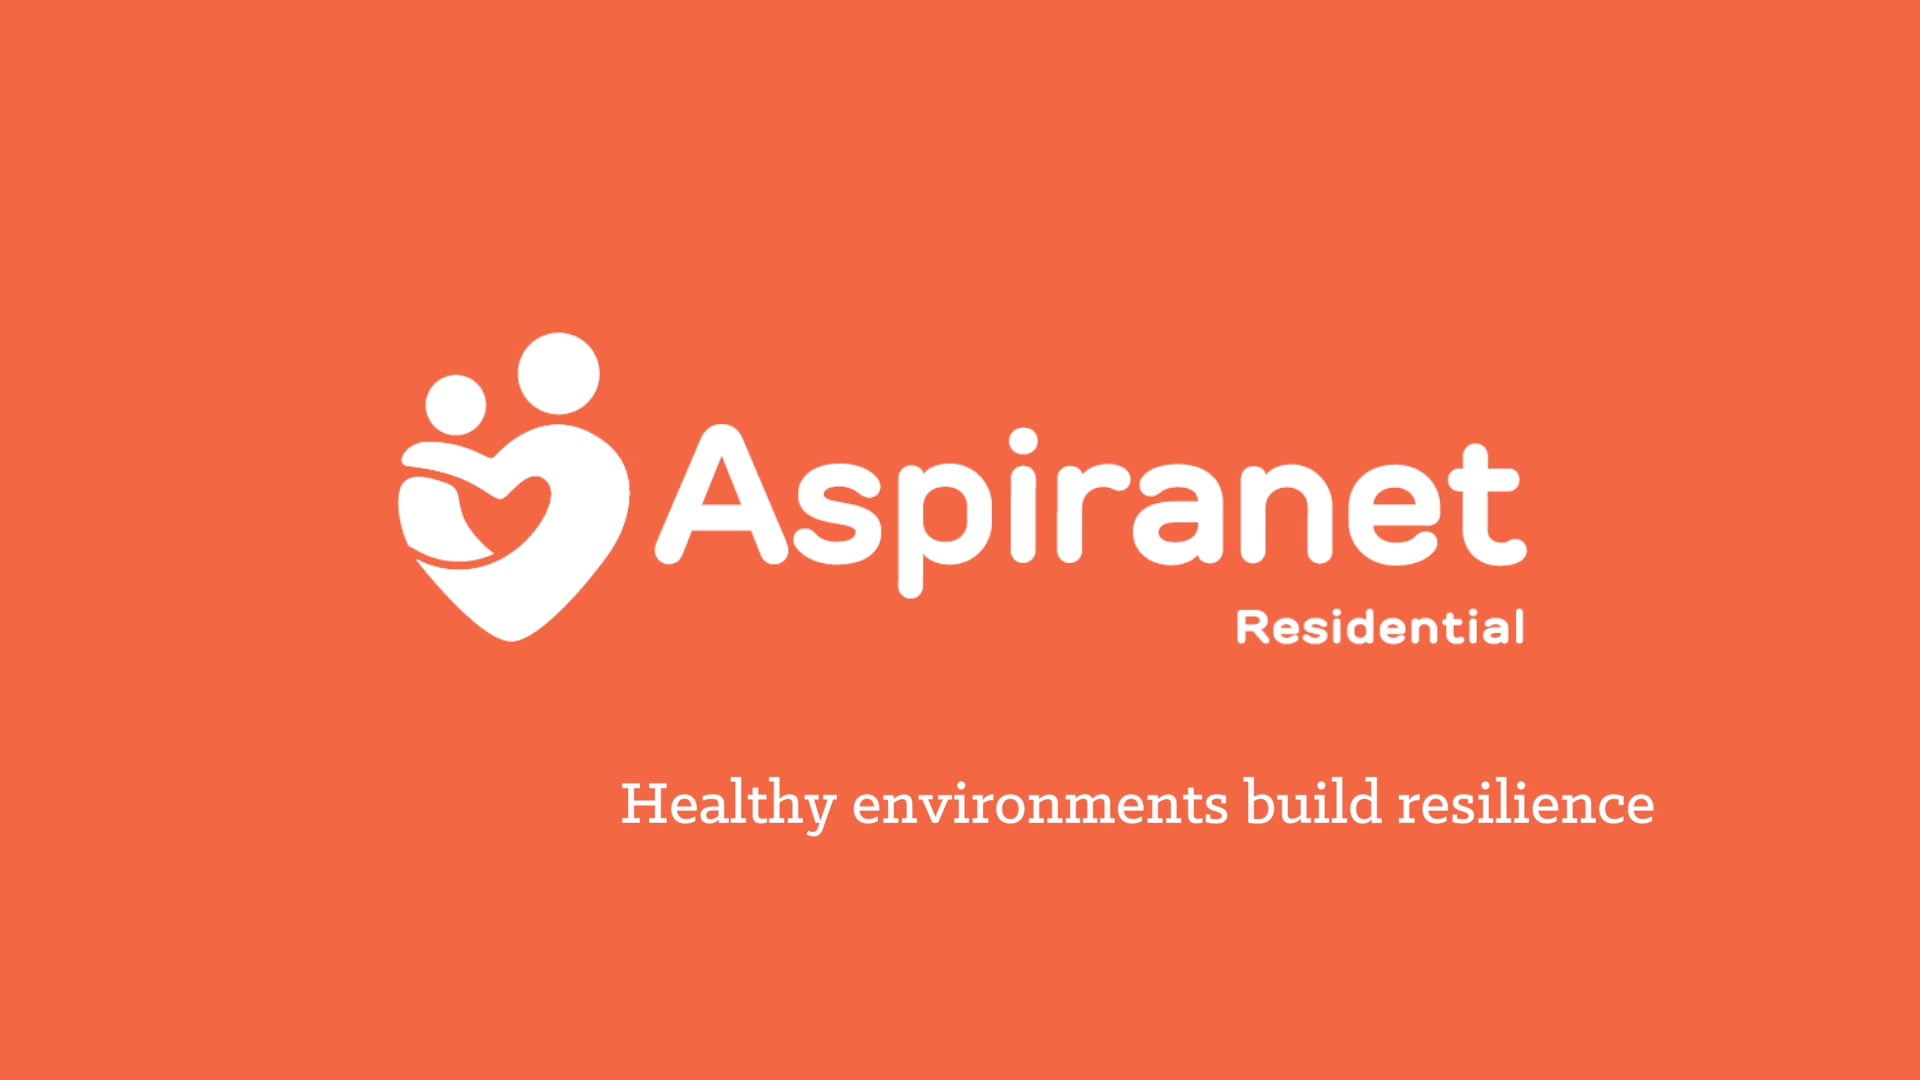 Aspiranet Residential